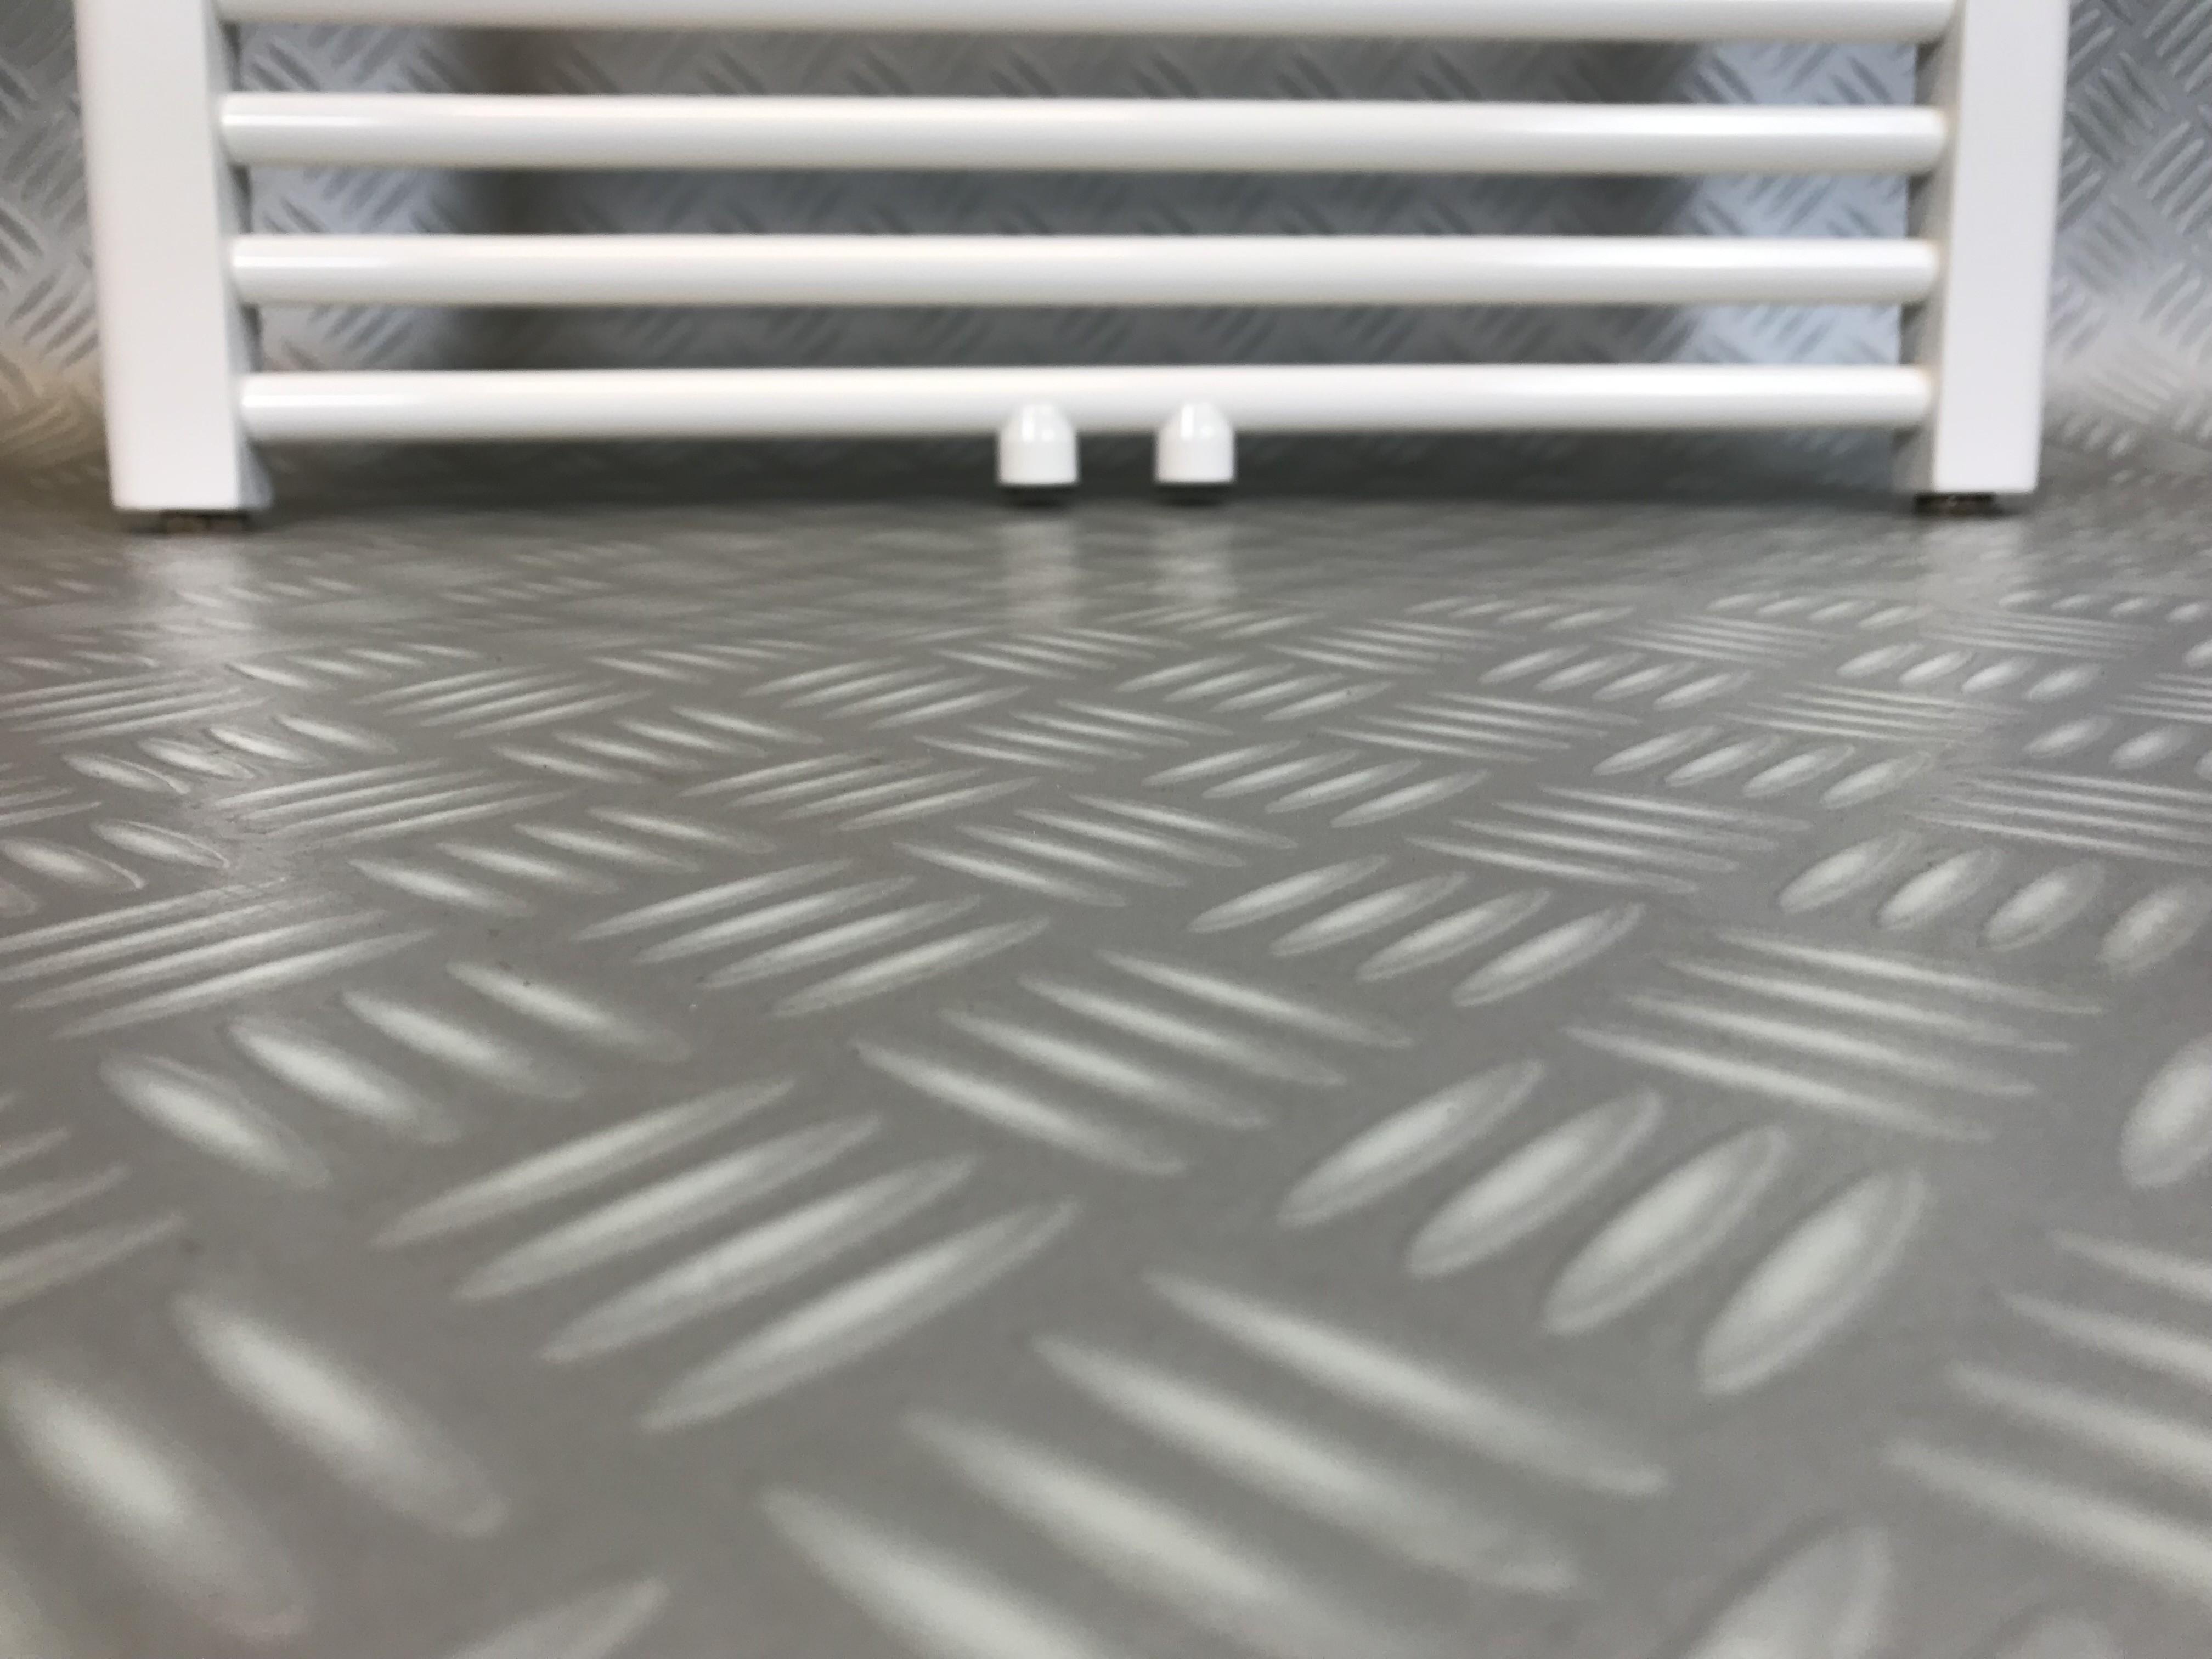 Badkamer Radiator Aanbieding : Badkamer design radiator breed hoog